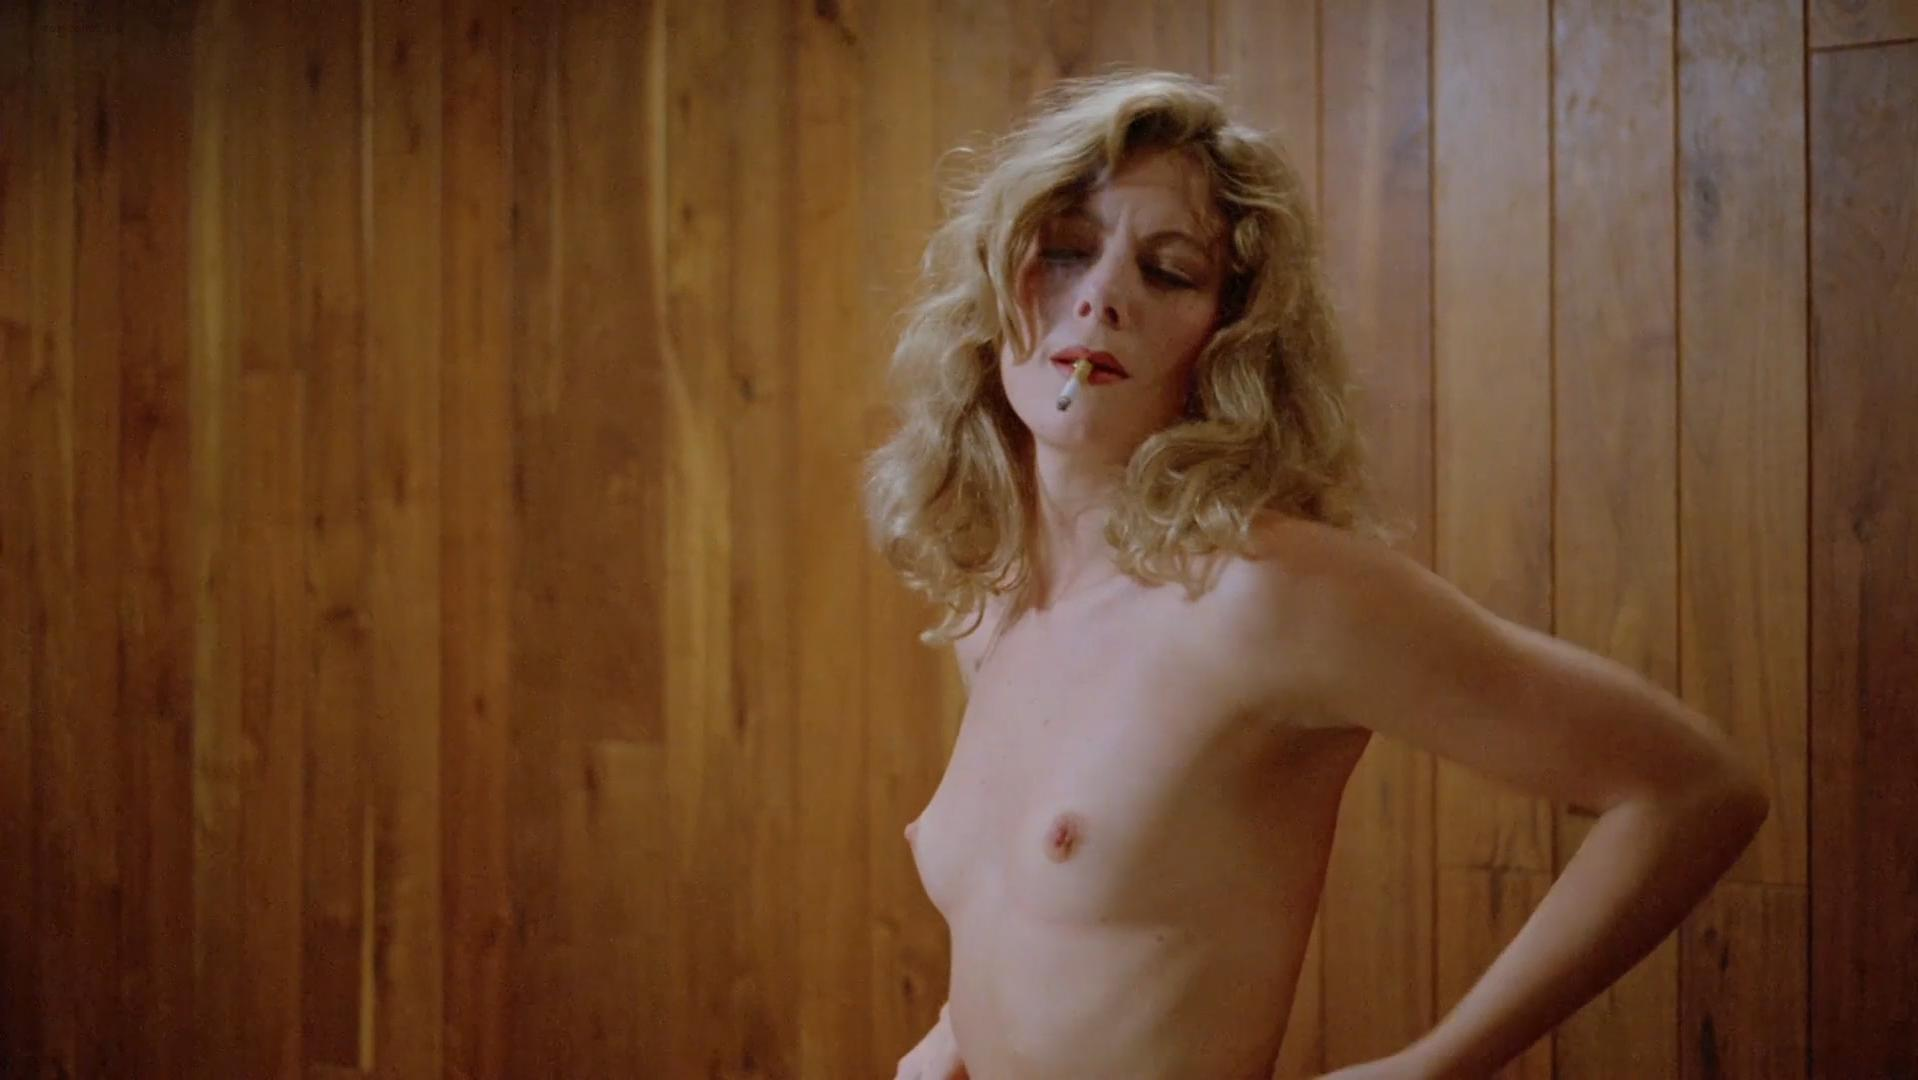 Camille Keaton Nude